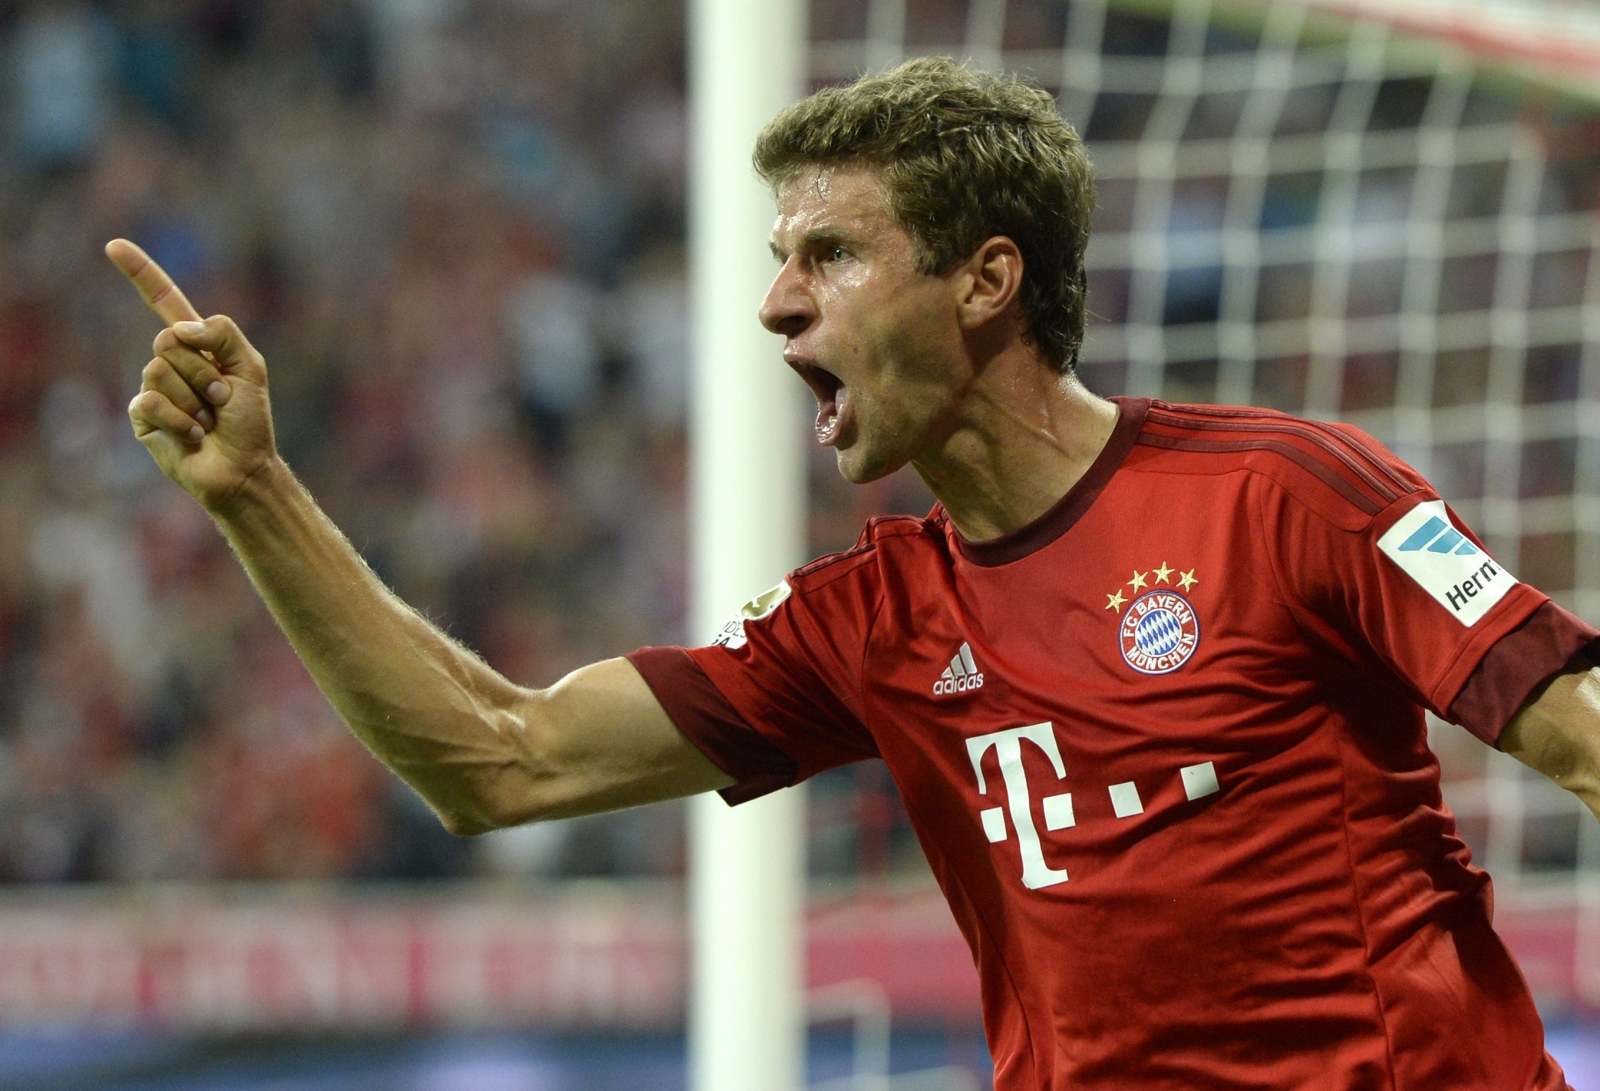 Bayern Munich striker Thomas Muller will not follow Pep Guardiola